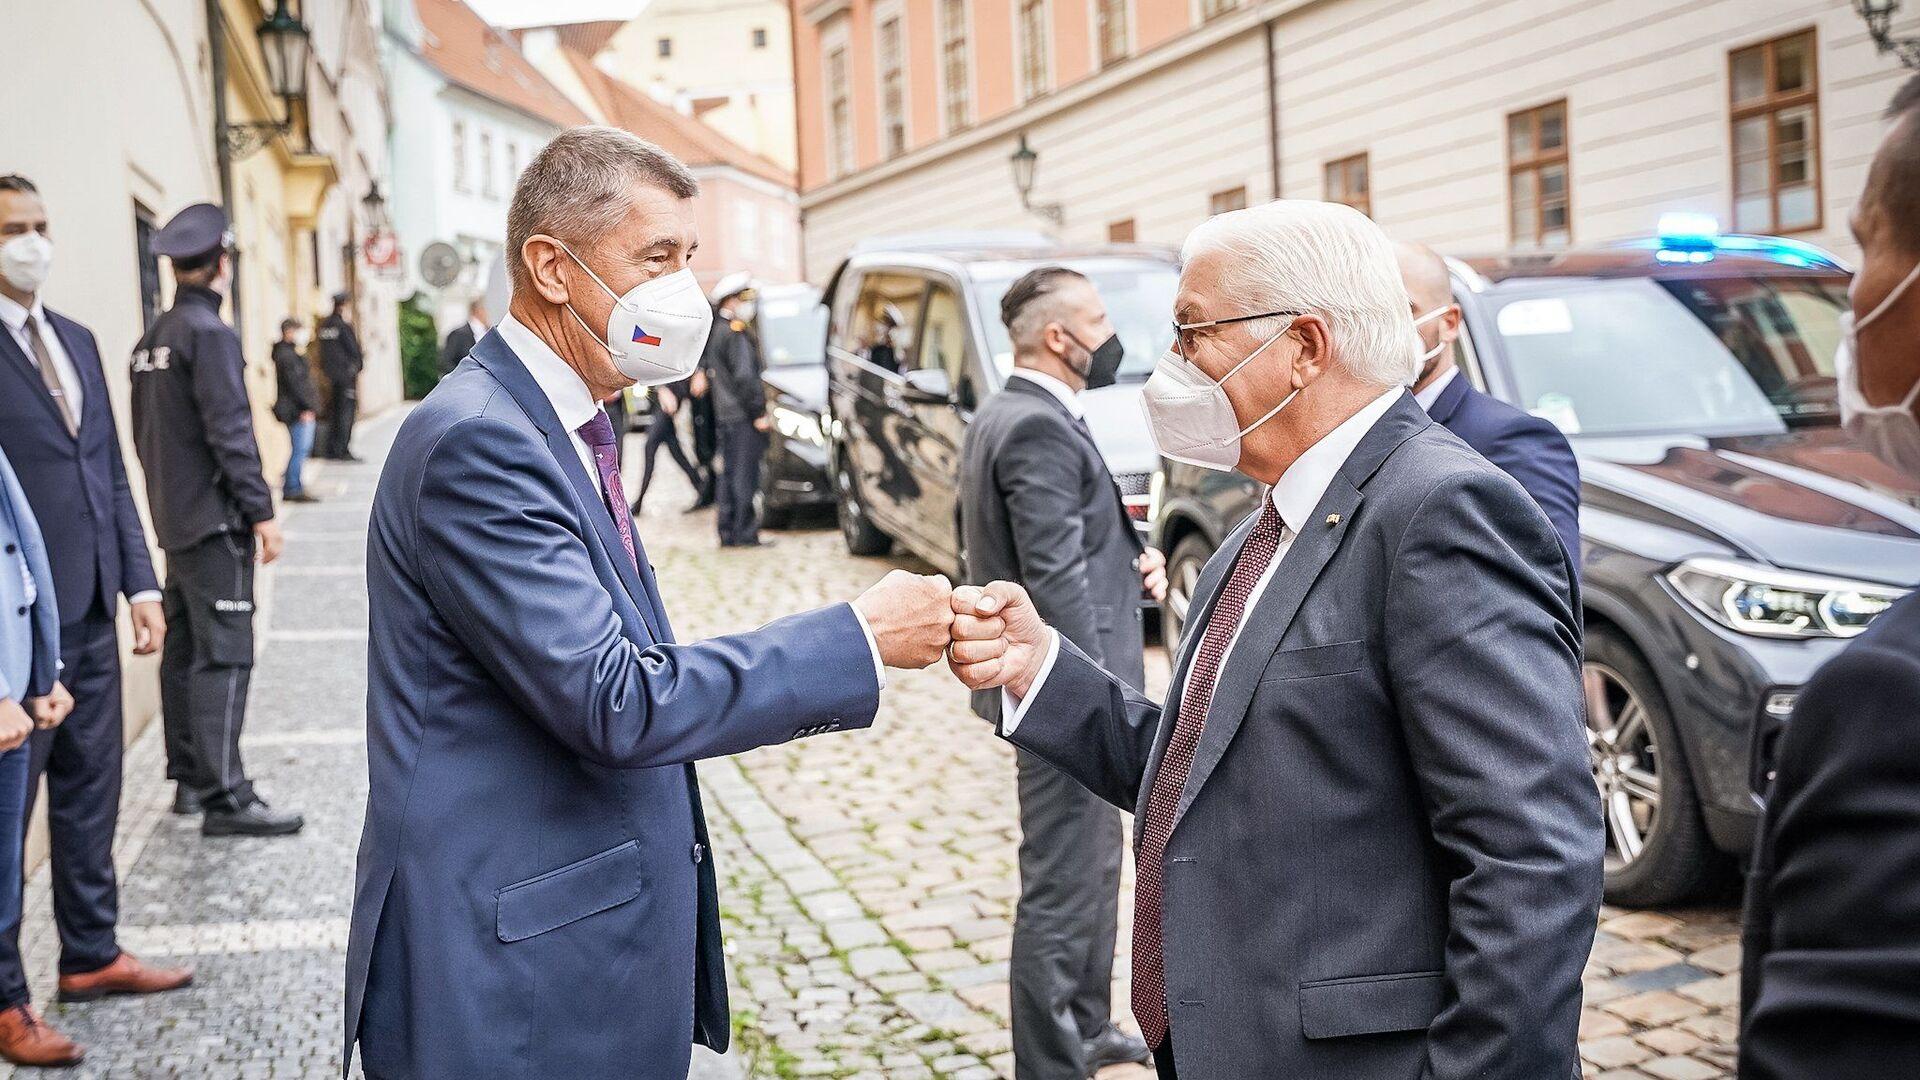 Frank-Walter Steinmeier s premiérem Andrejem Babišem  - Sputnik Česká republika, 1920, 27.08.2021